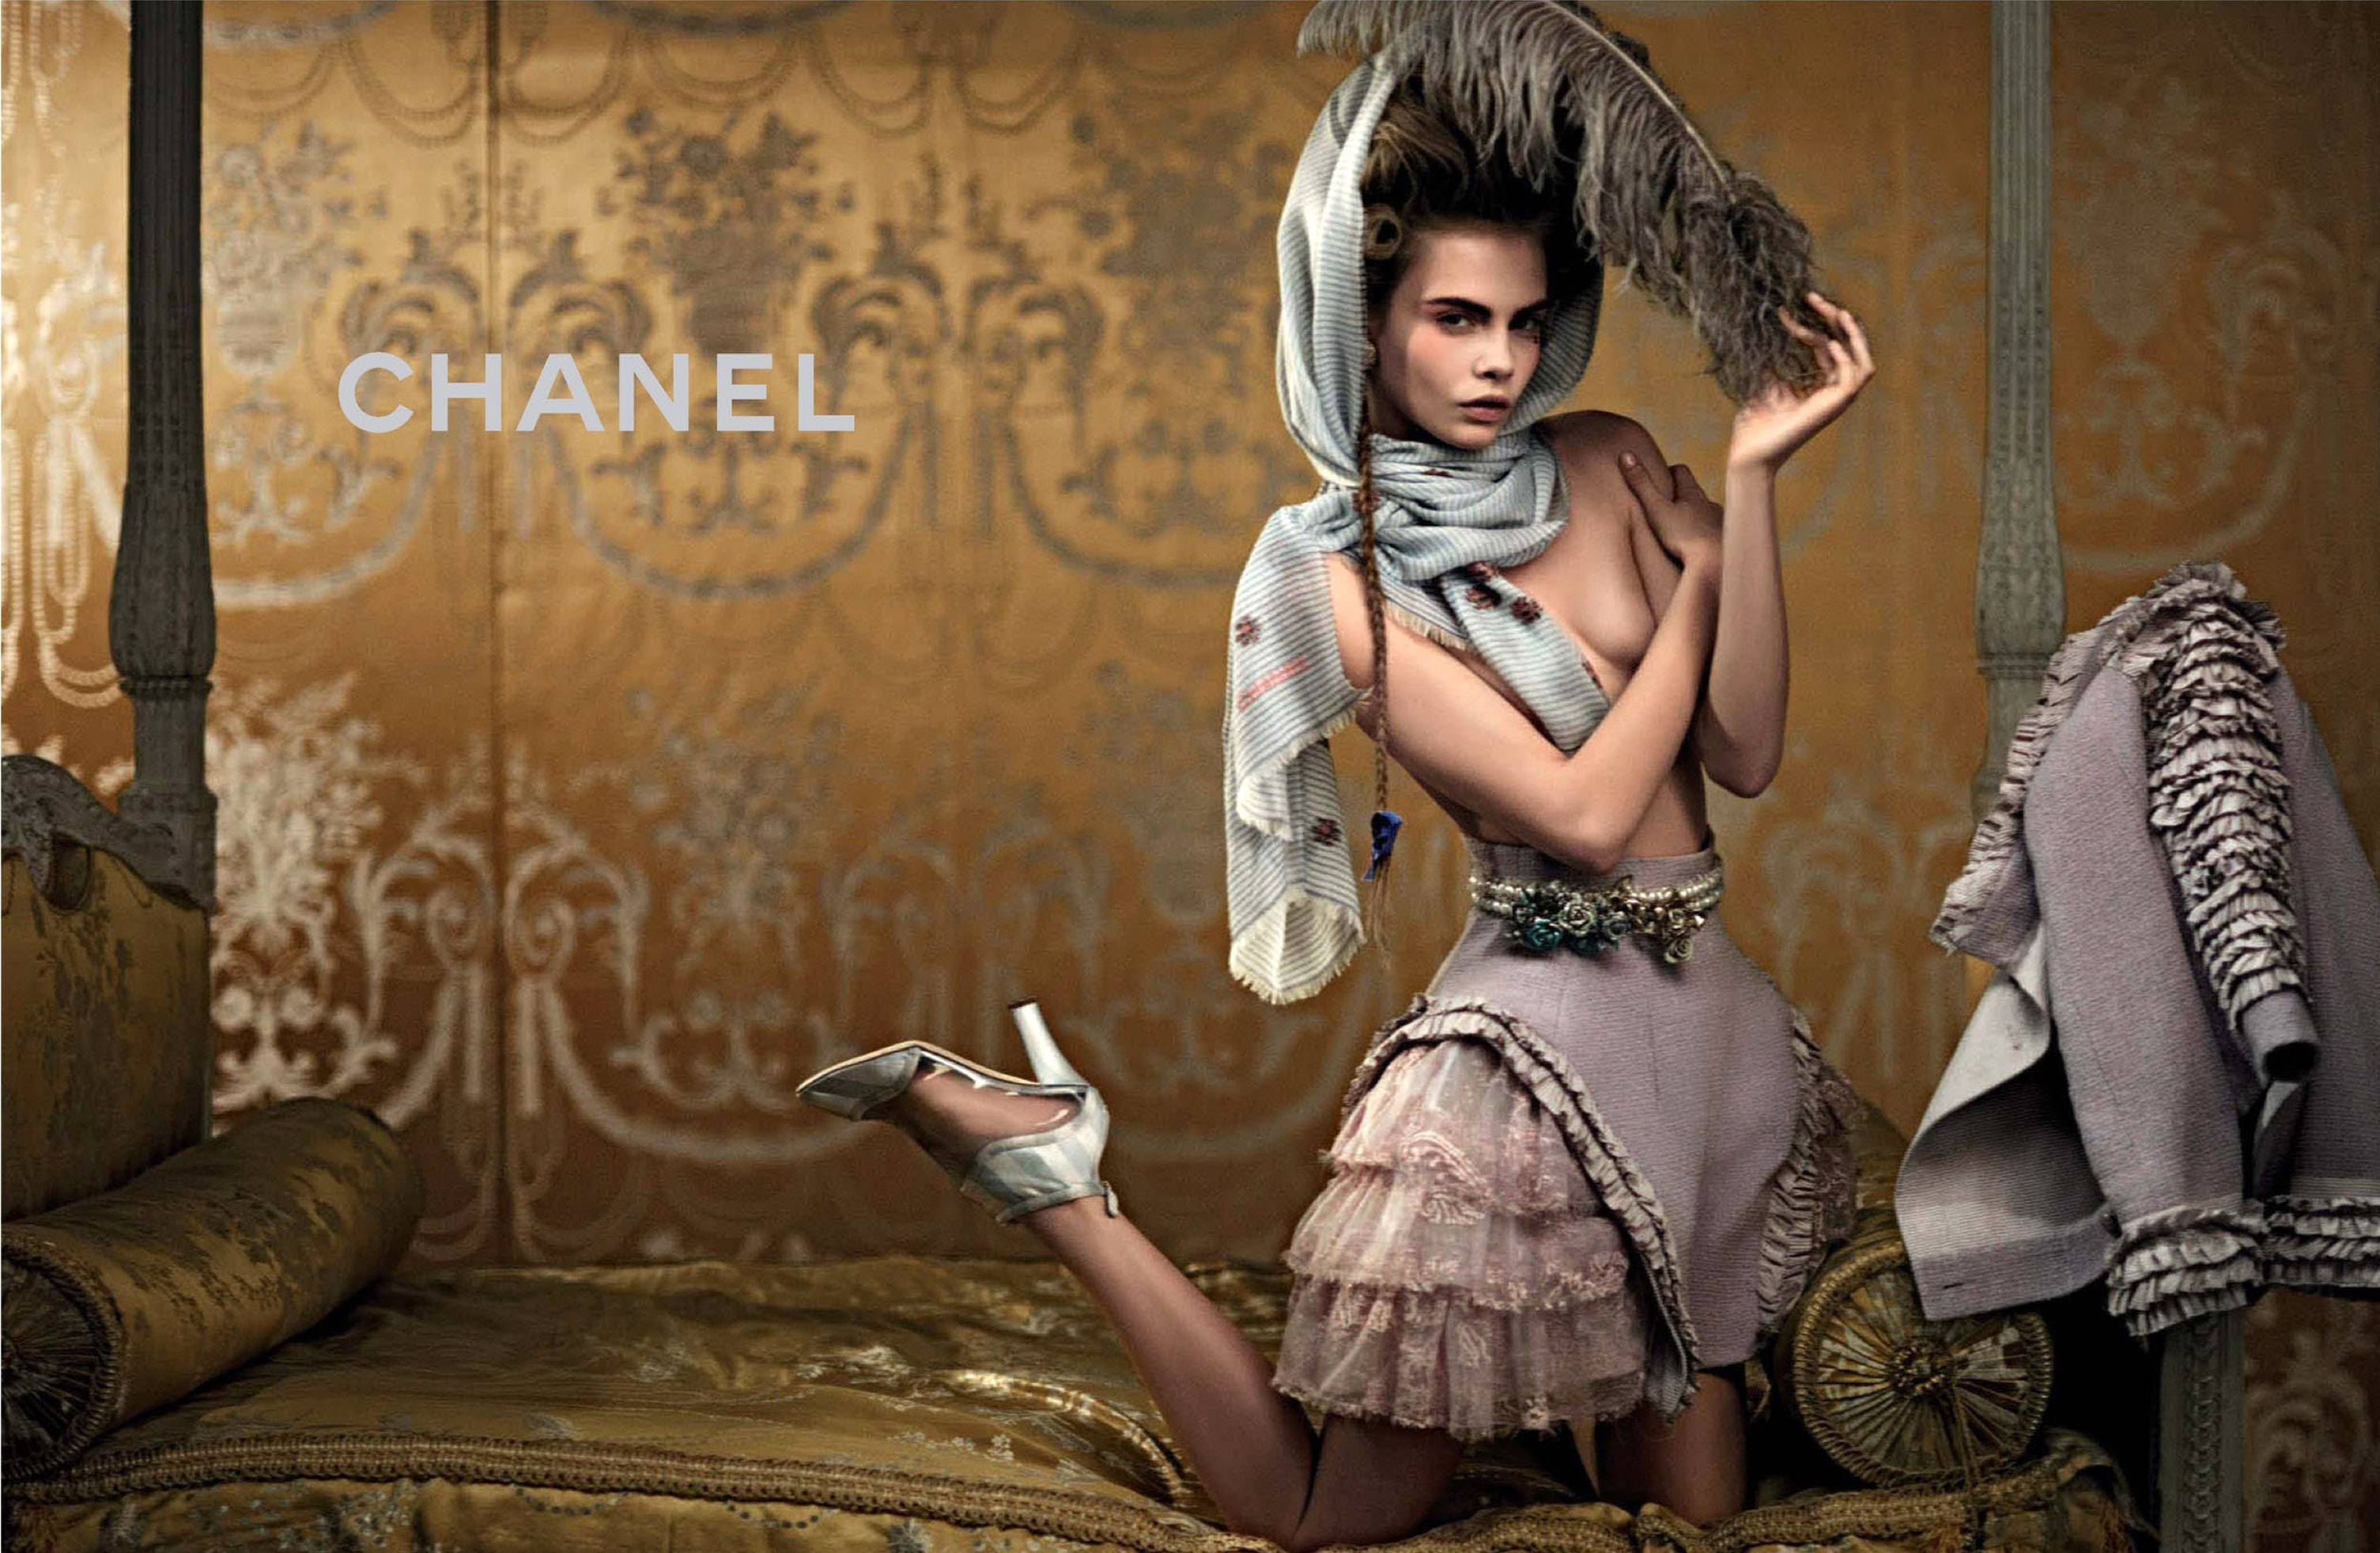 Quale it-girl Chanel ti rappresenta? [TEST]